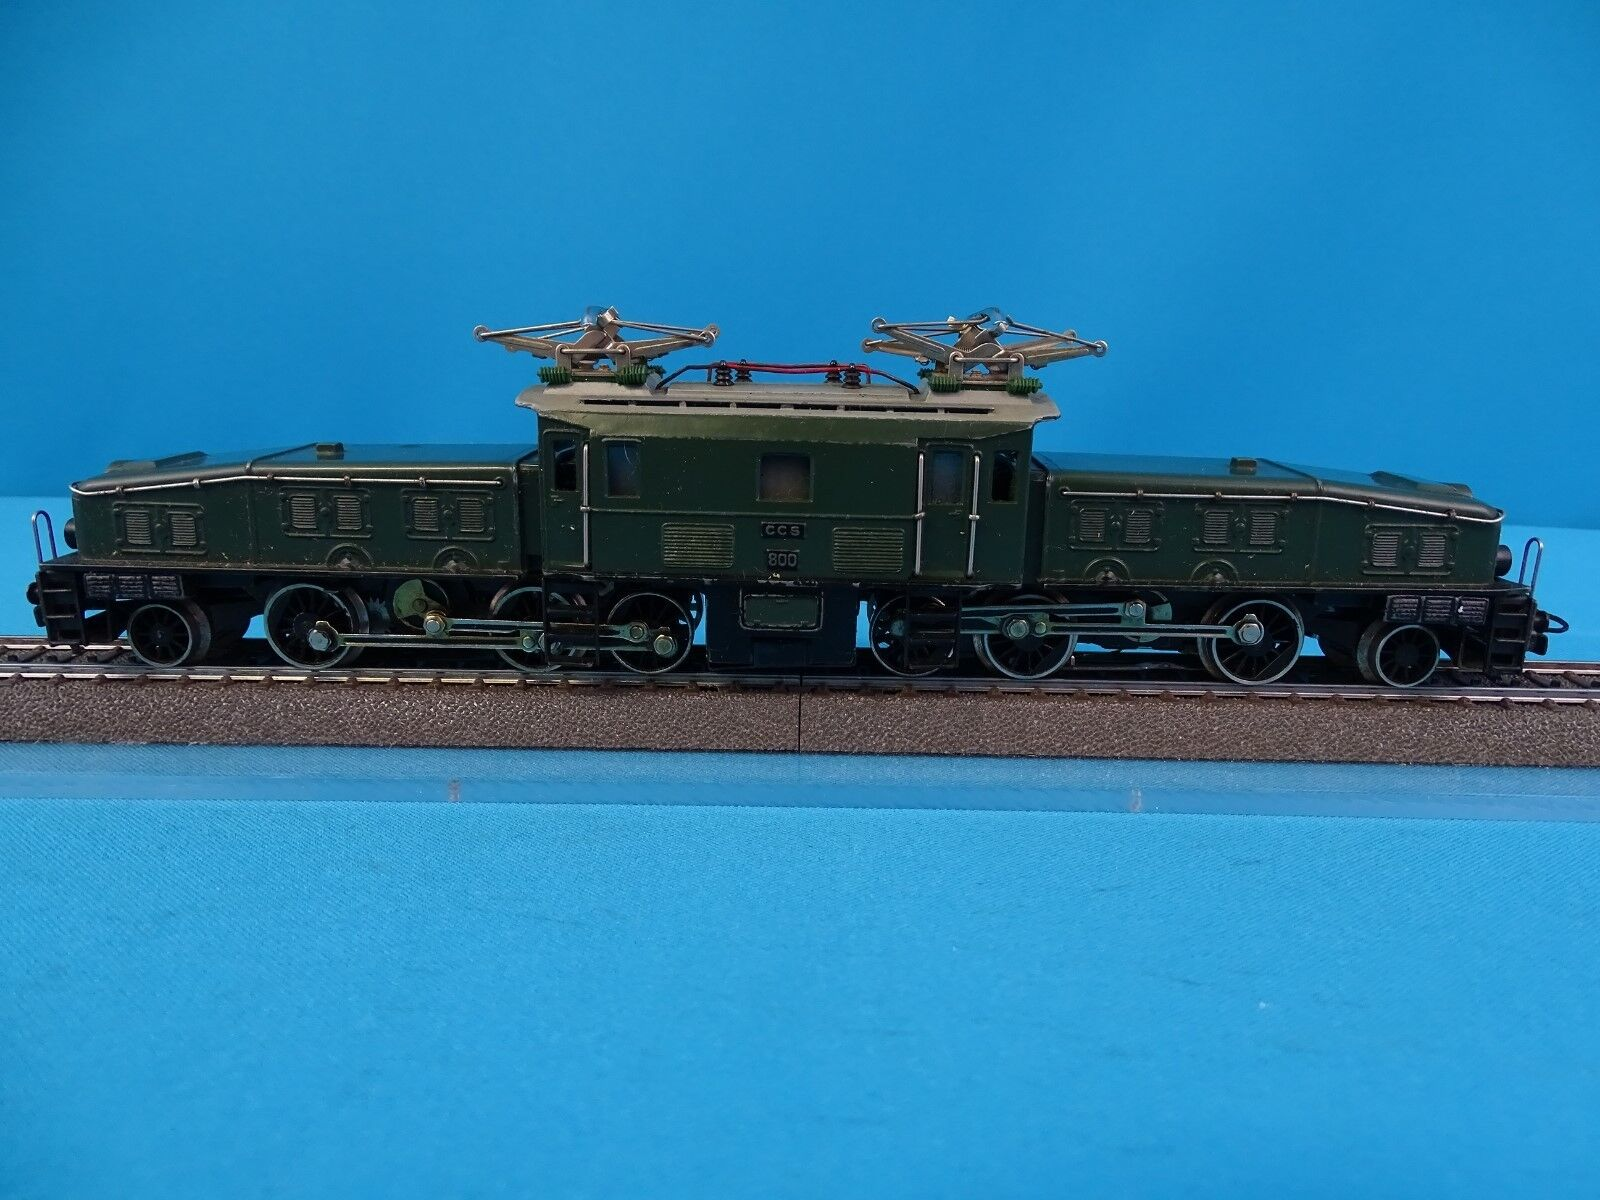 Marklin ccs 800 sbb cff elektrische lokomotive br ce 6   8 krokodil version 9 1957